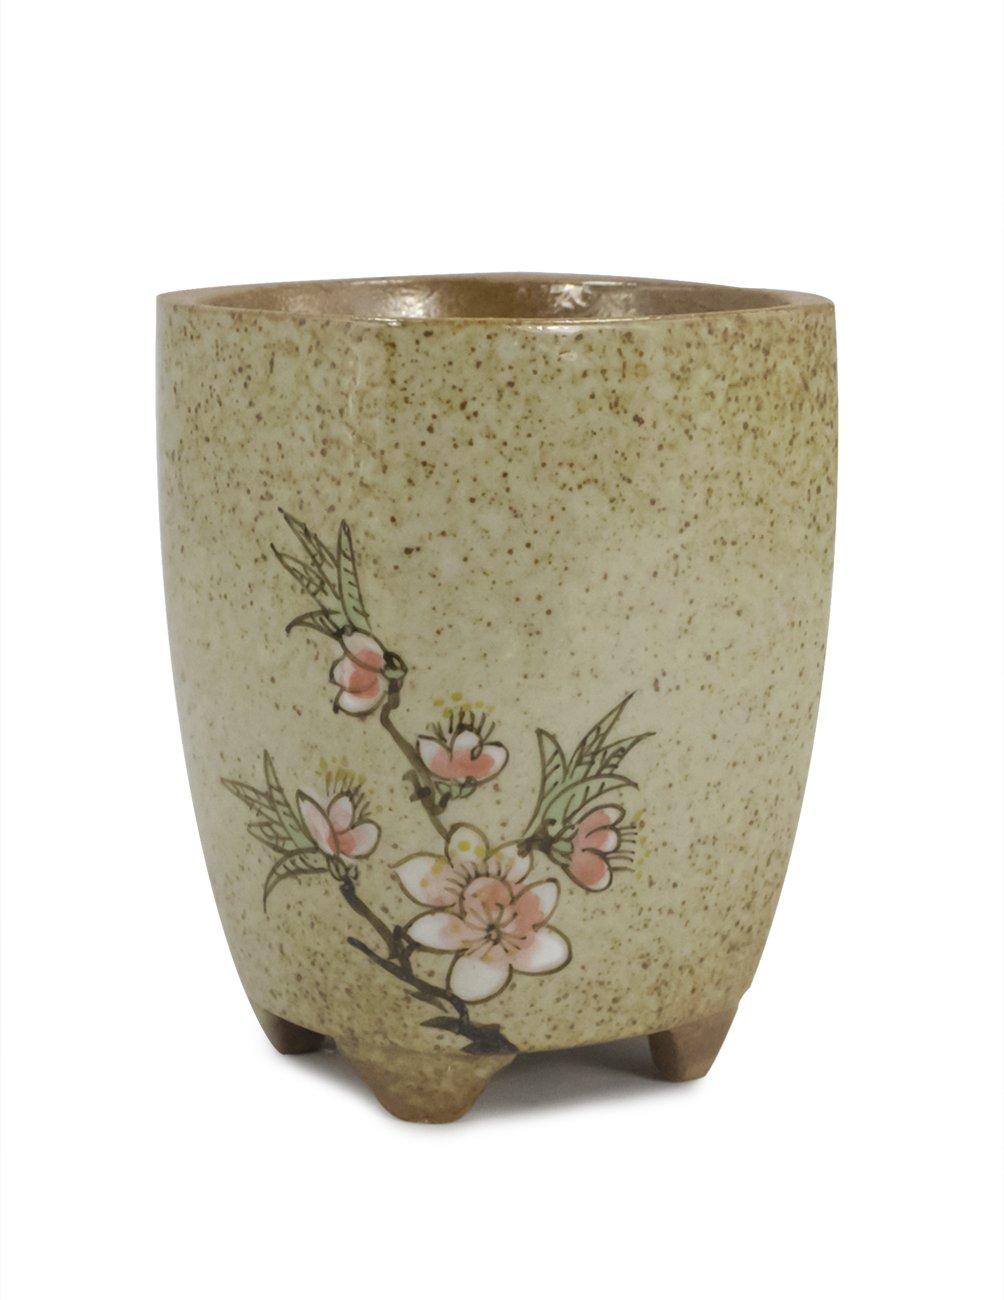 Cheap Painted Ceramic Flower Planter Find Painted Ceramic Flower Planter Deals On Line At Alibaba Com